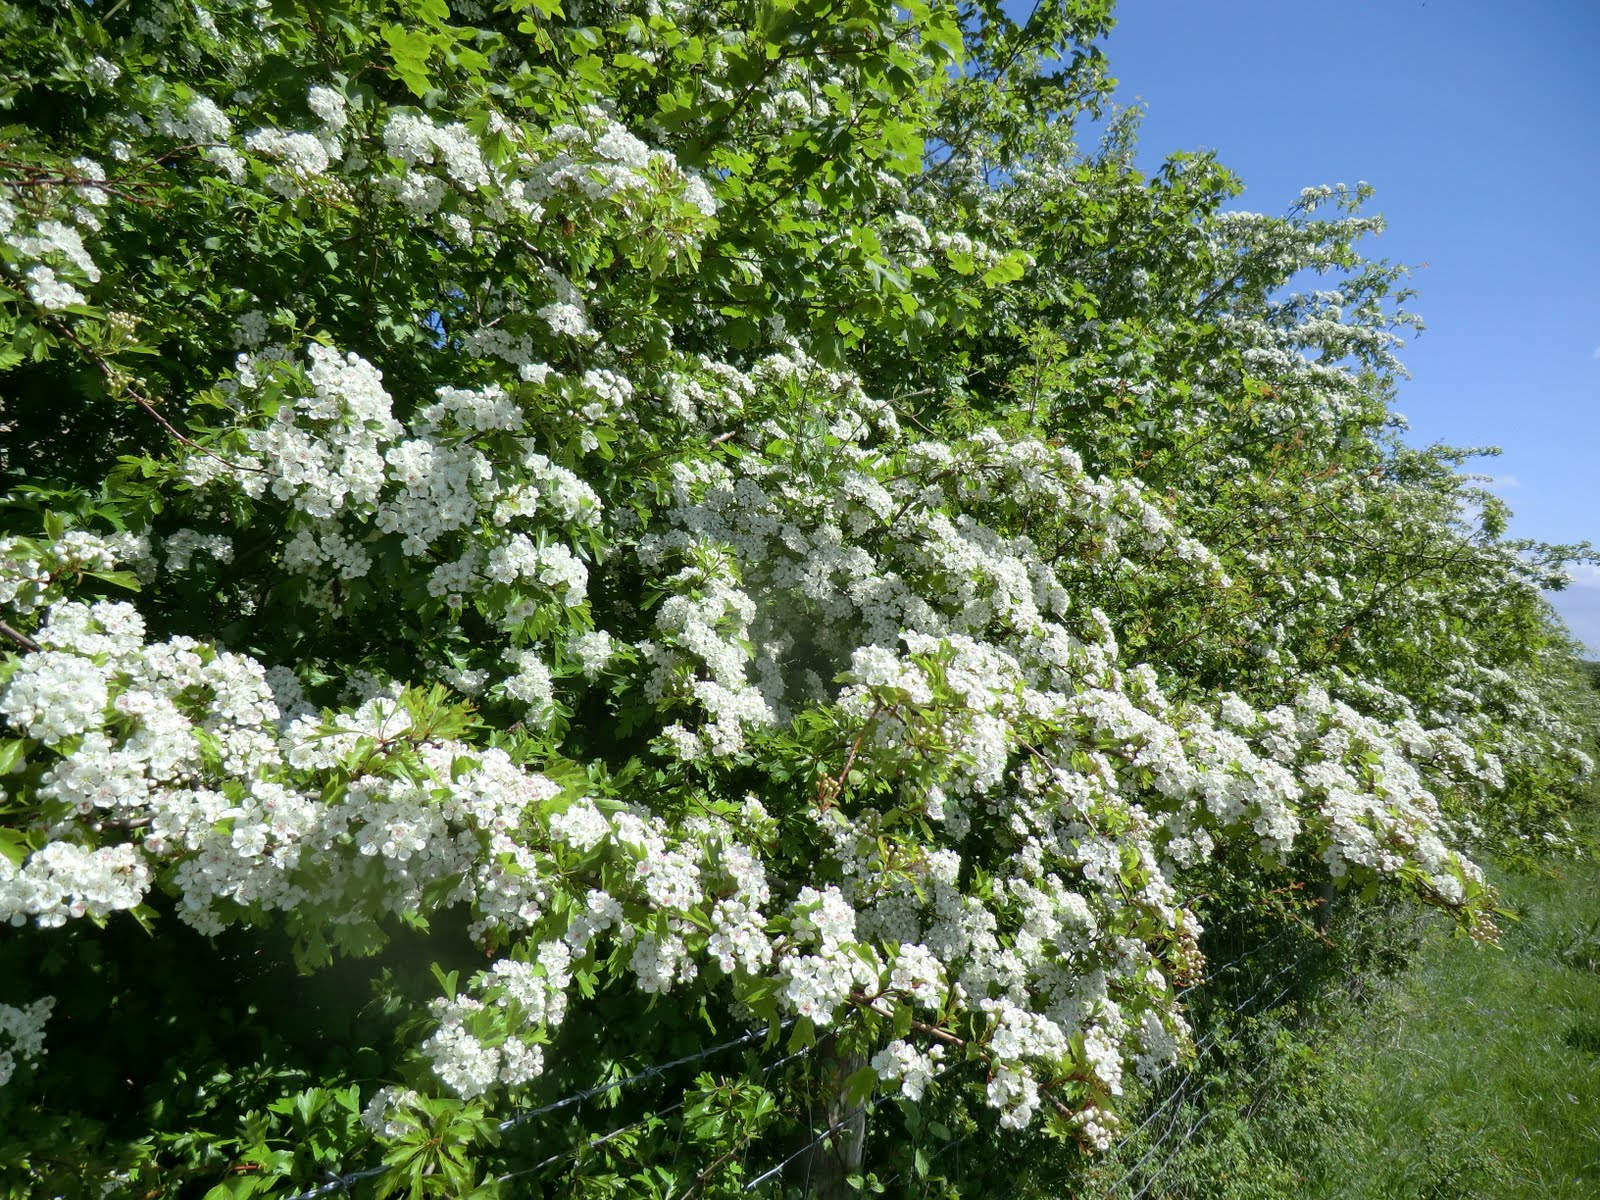 CIMG8130 Hawthorn hedgerow